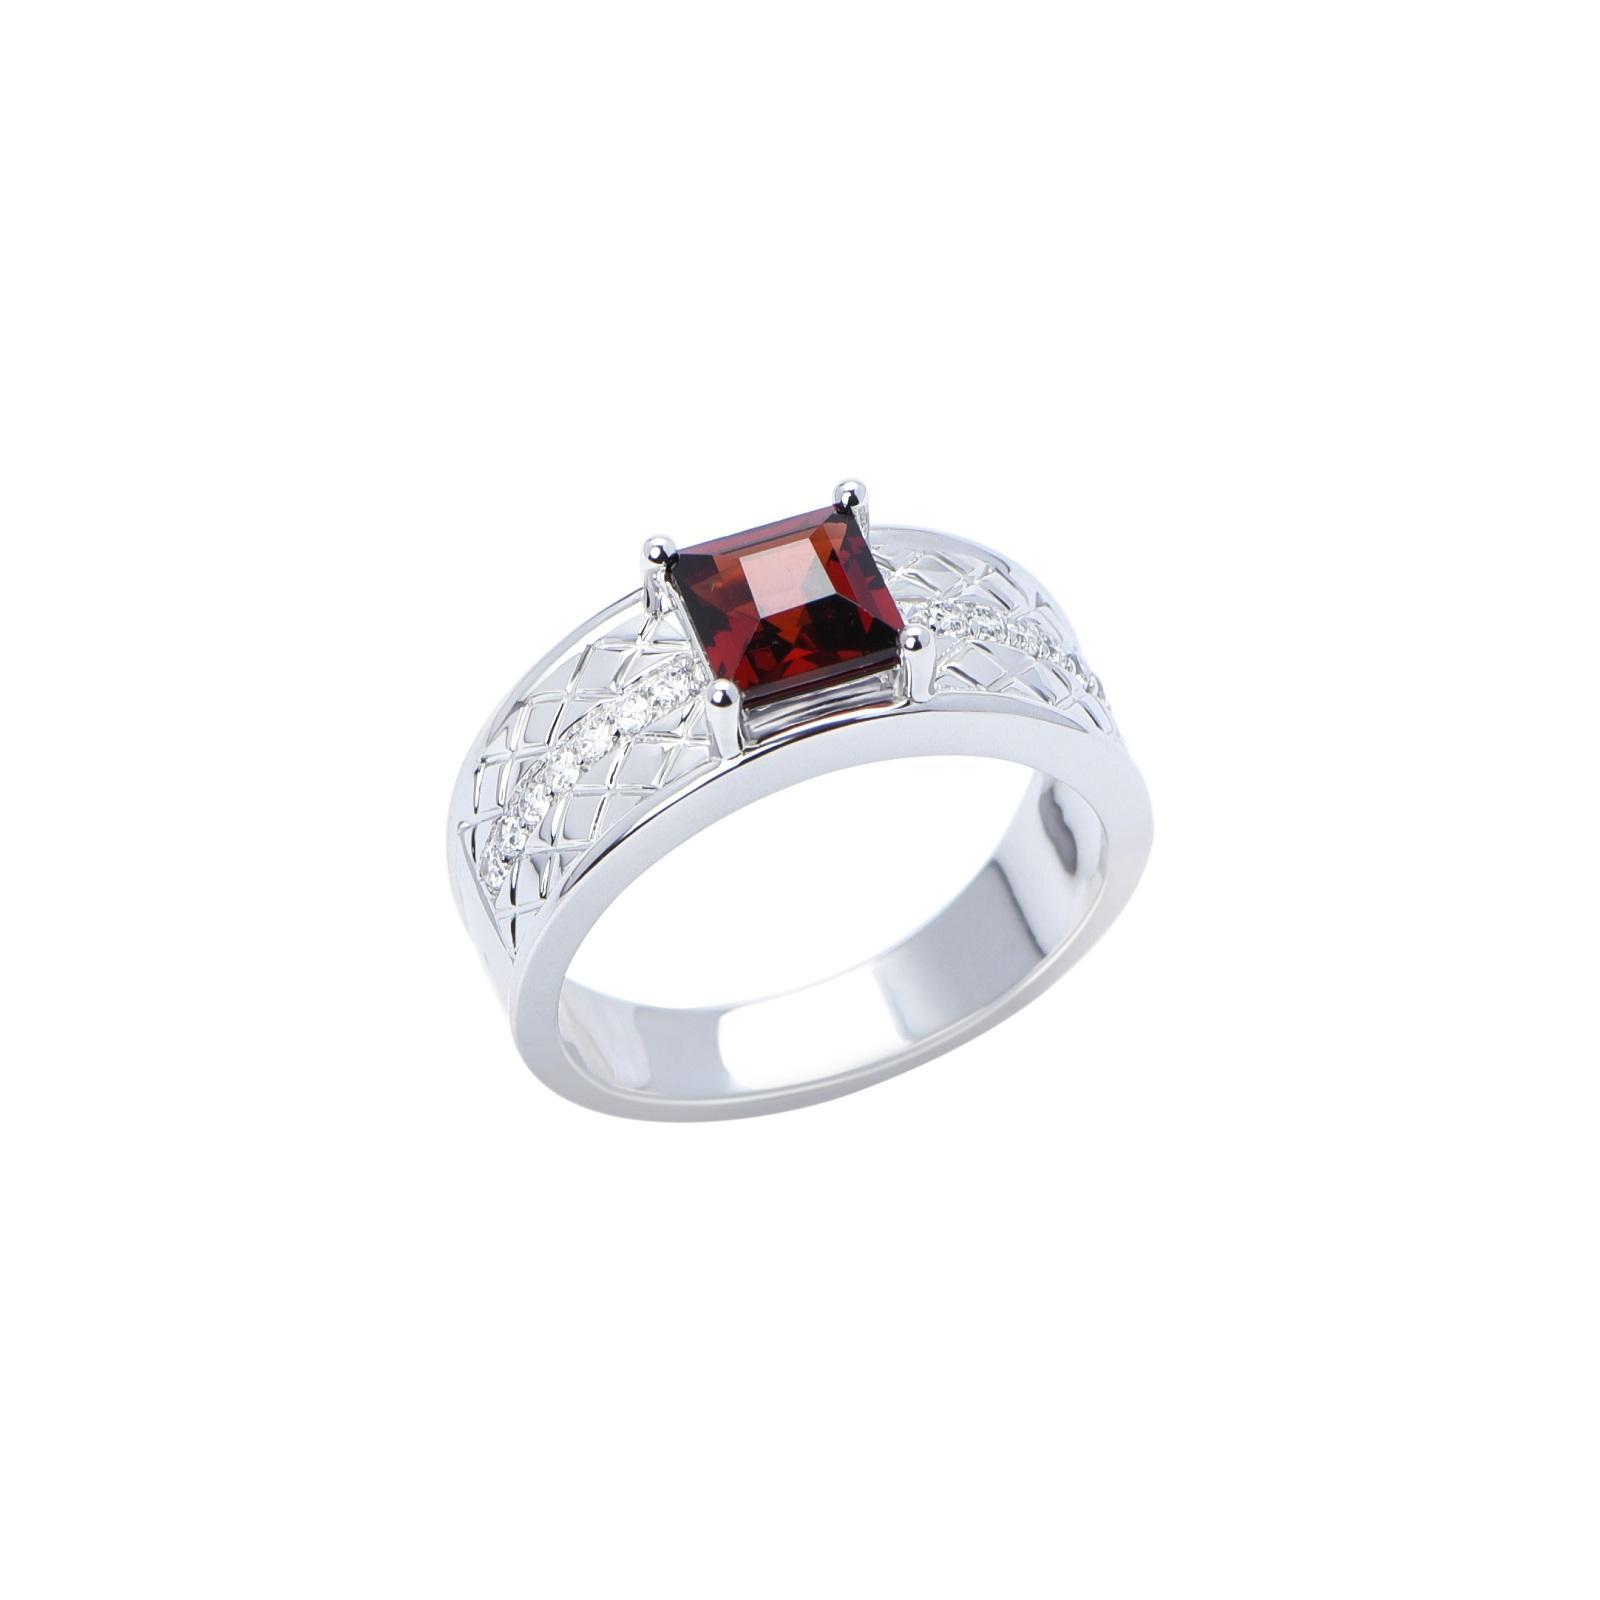 Nhẫn nam đá Garnet 21NN045